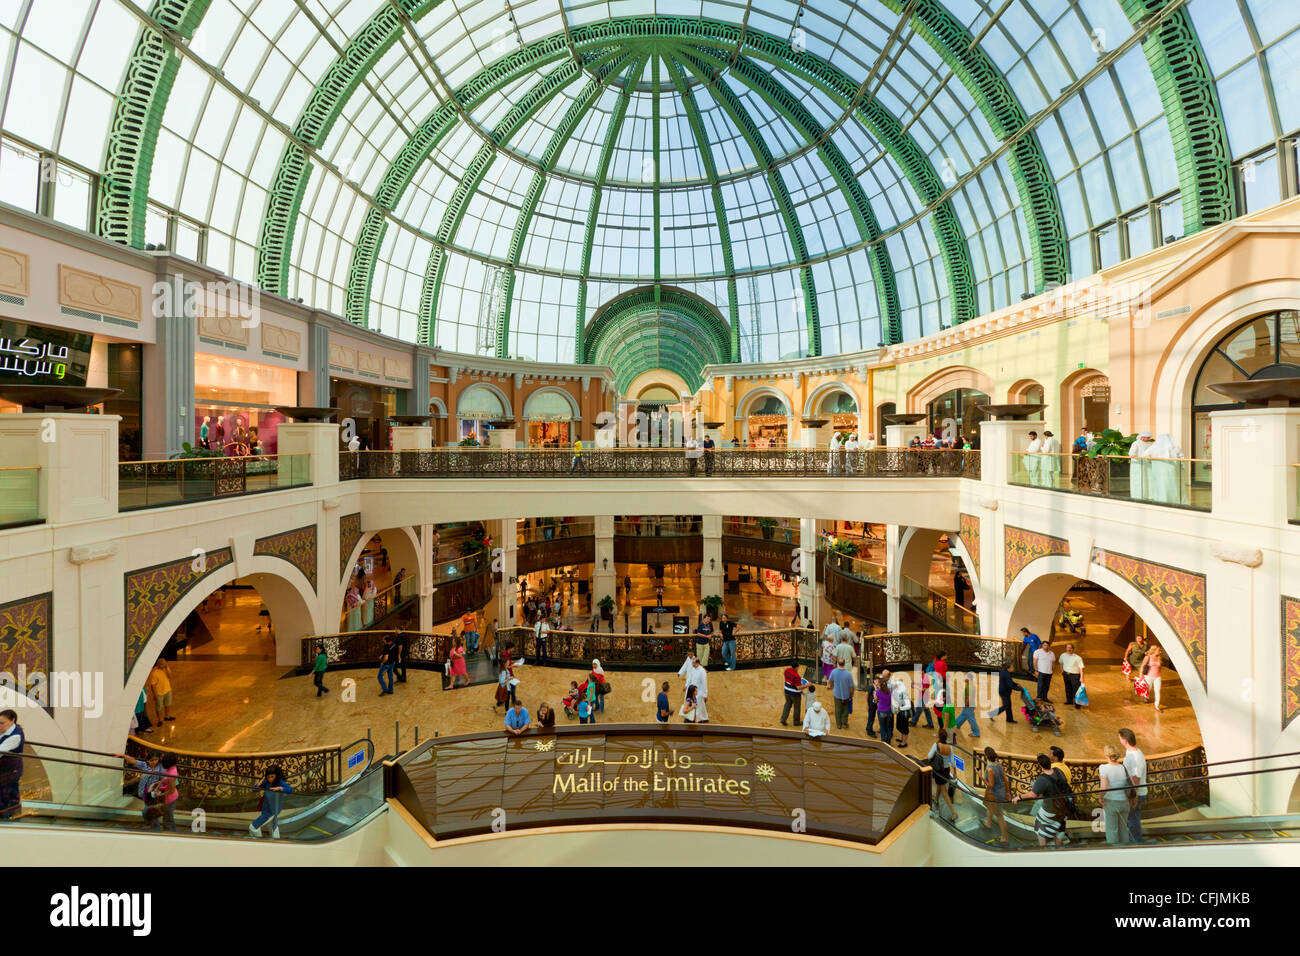 Interior de Mall de los Emiratos, Dubai, Emiratos Árabes Unidos, Oriente Medio Imagen De Stock